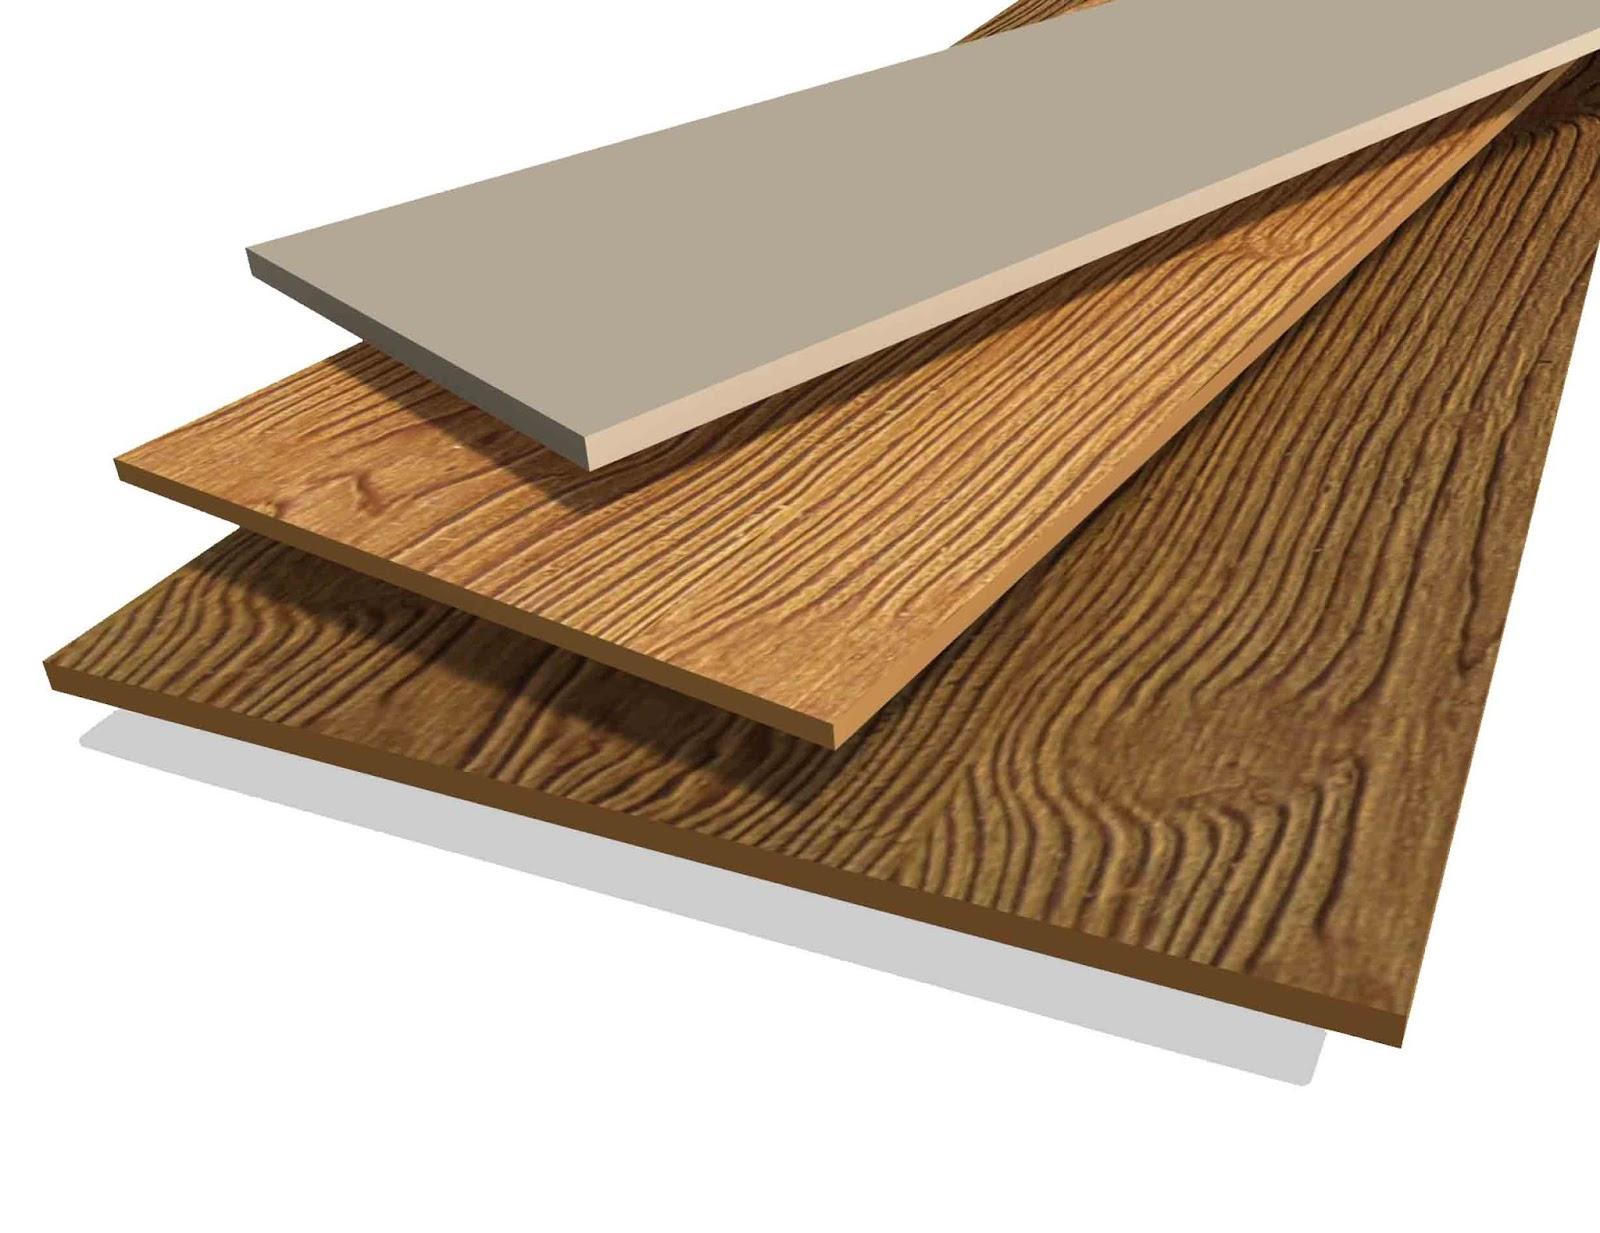 Plafon Pvc Tangerang Apa Itu Wood Plank